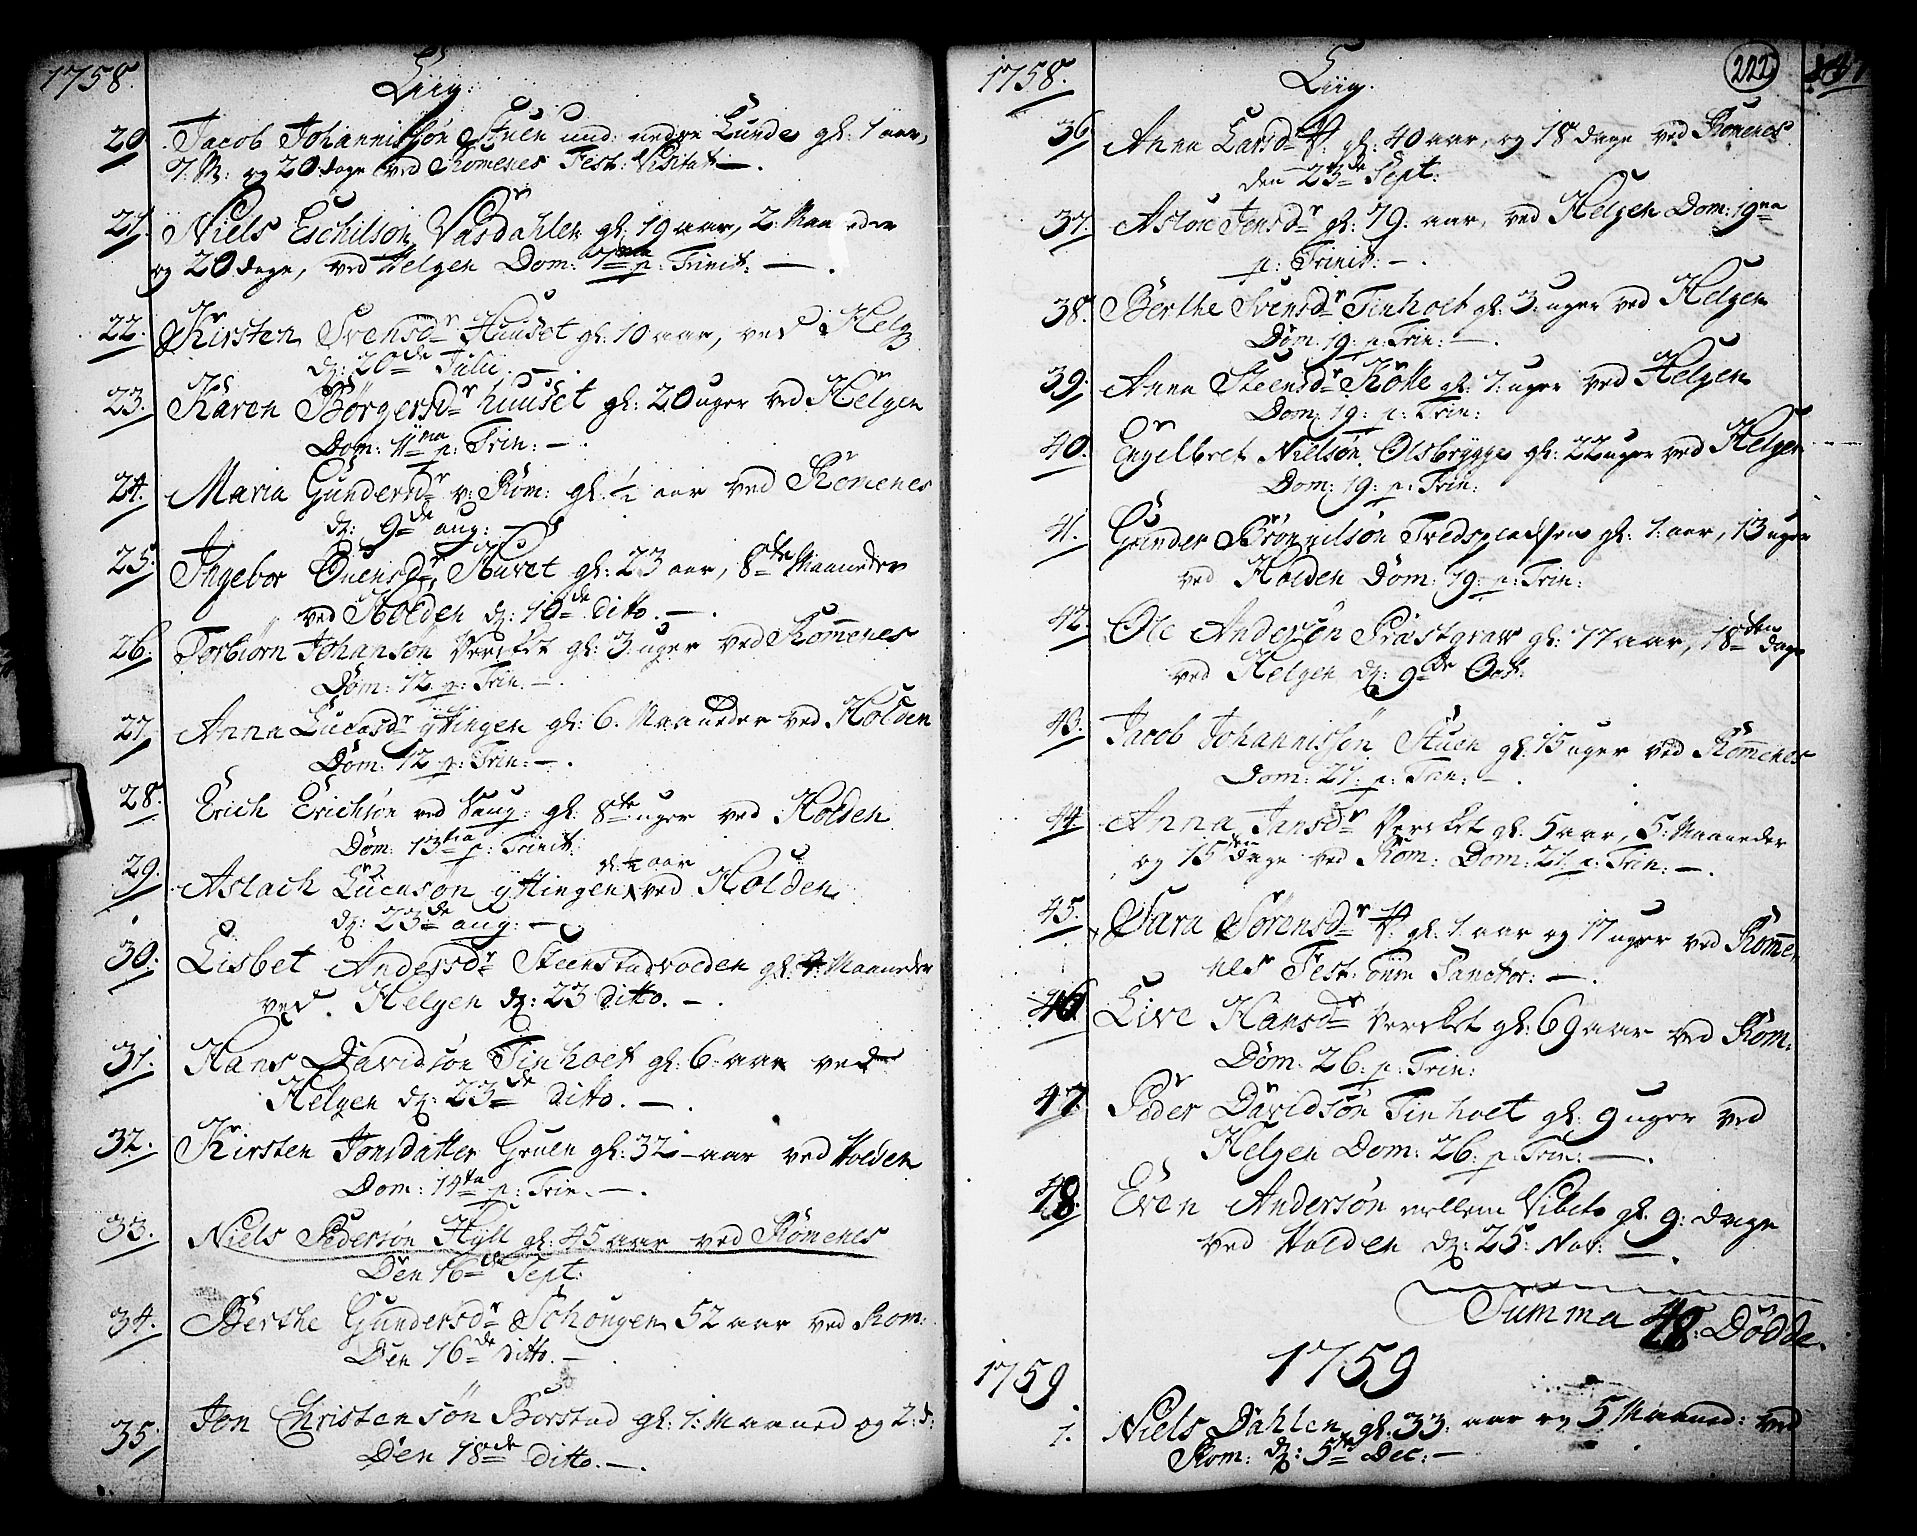 SAKO, Holla kirkebøker, F/Fa/L0001: Ministerialbok nr. 1, 1717-1779, s. 222